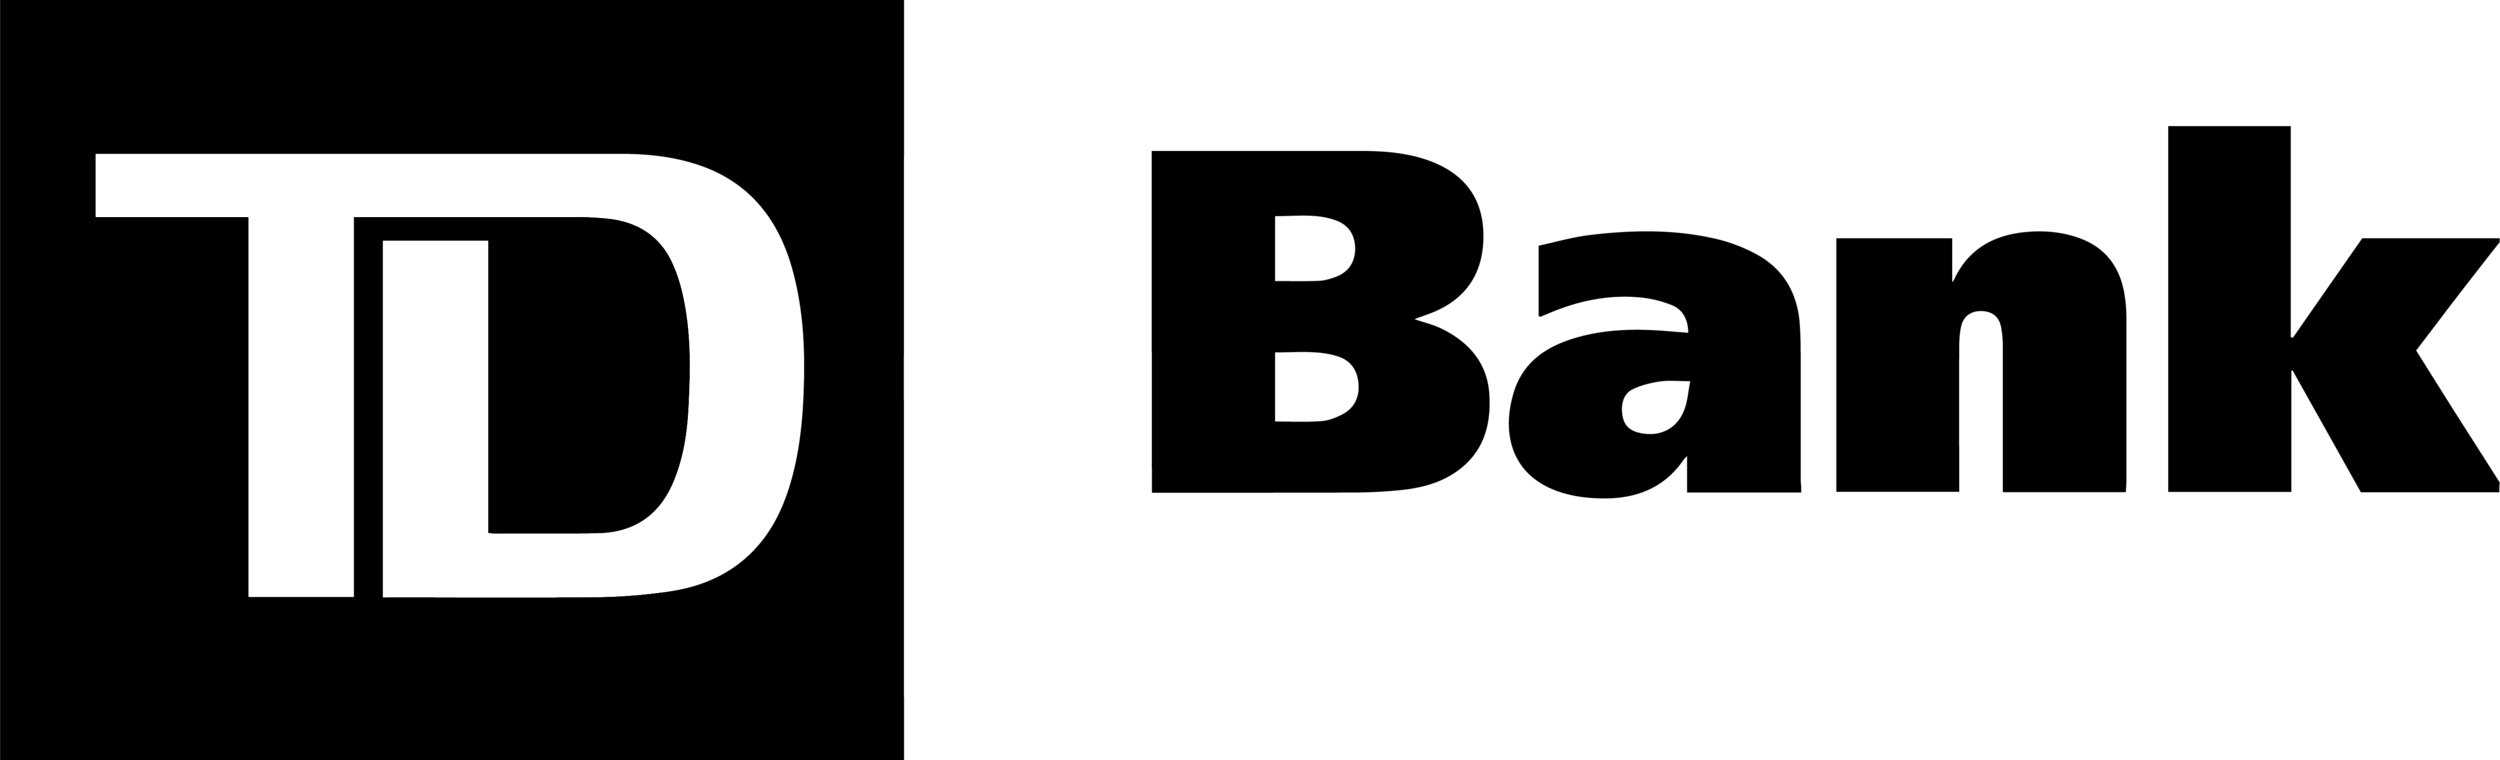 1280px-TD_Bank-Black.png